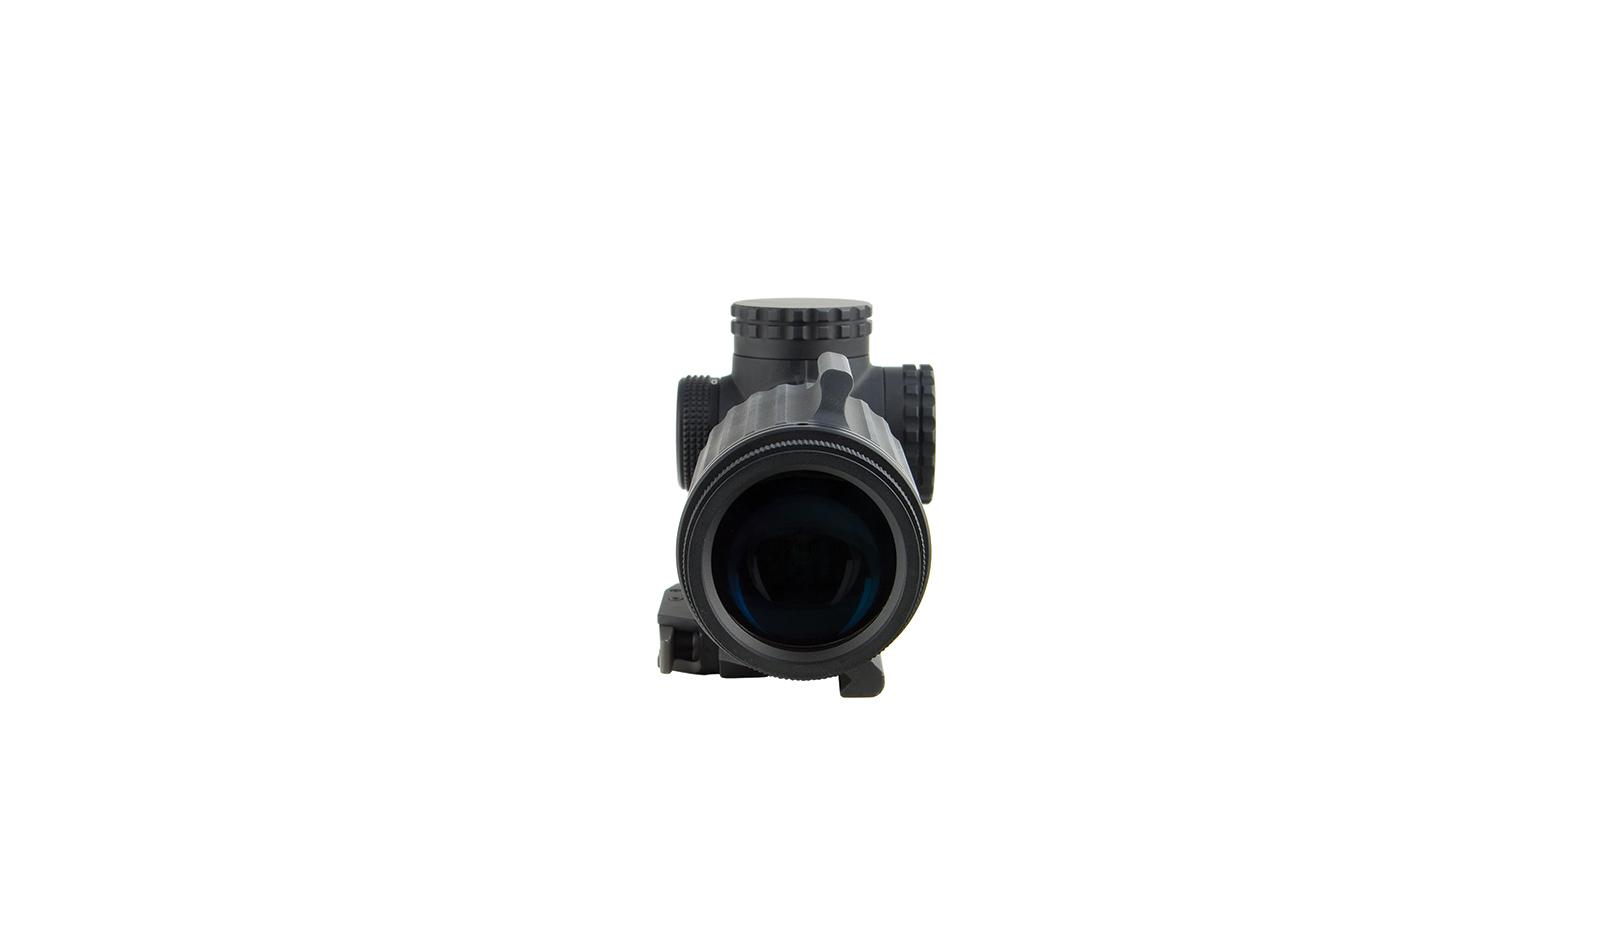 VC16-C-1600050 angle 4